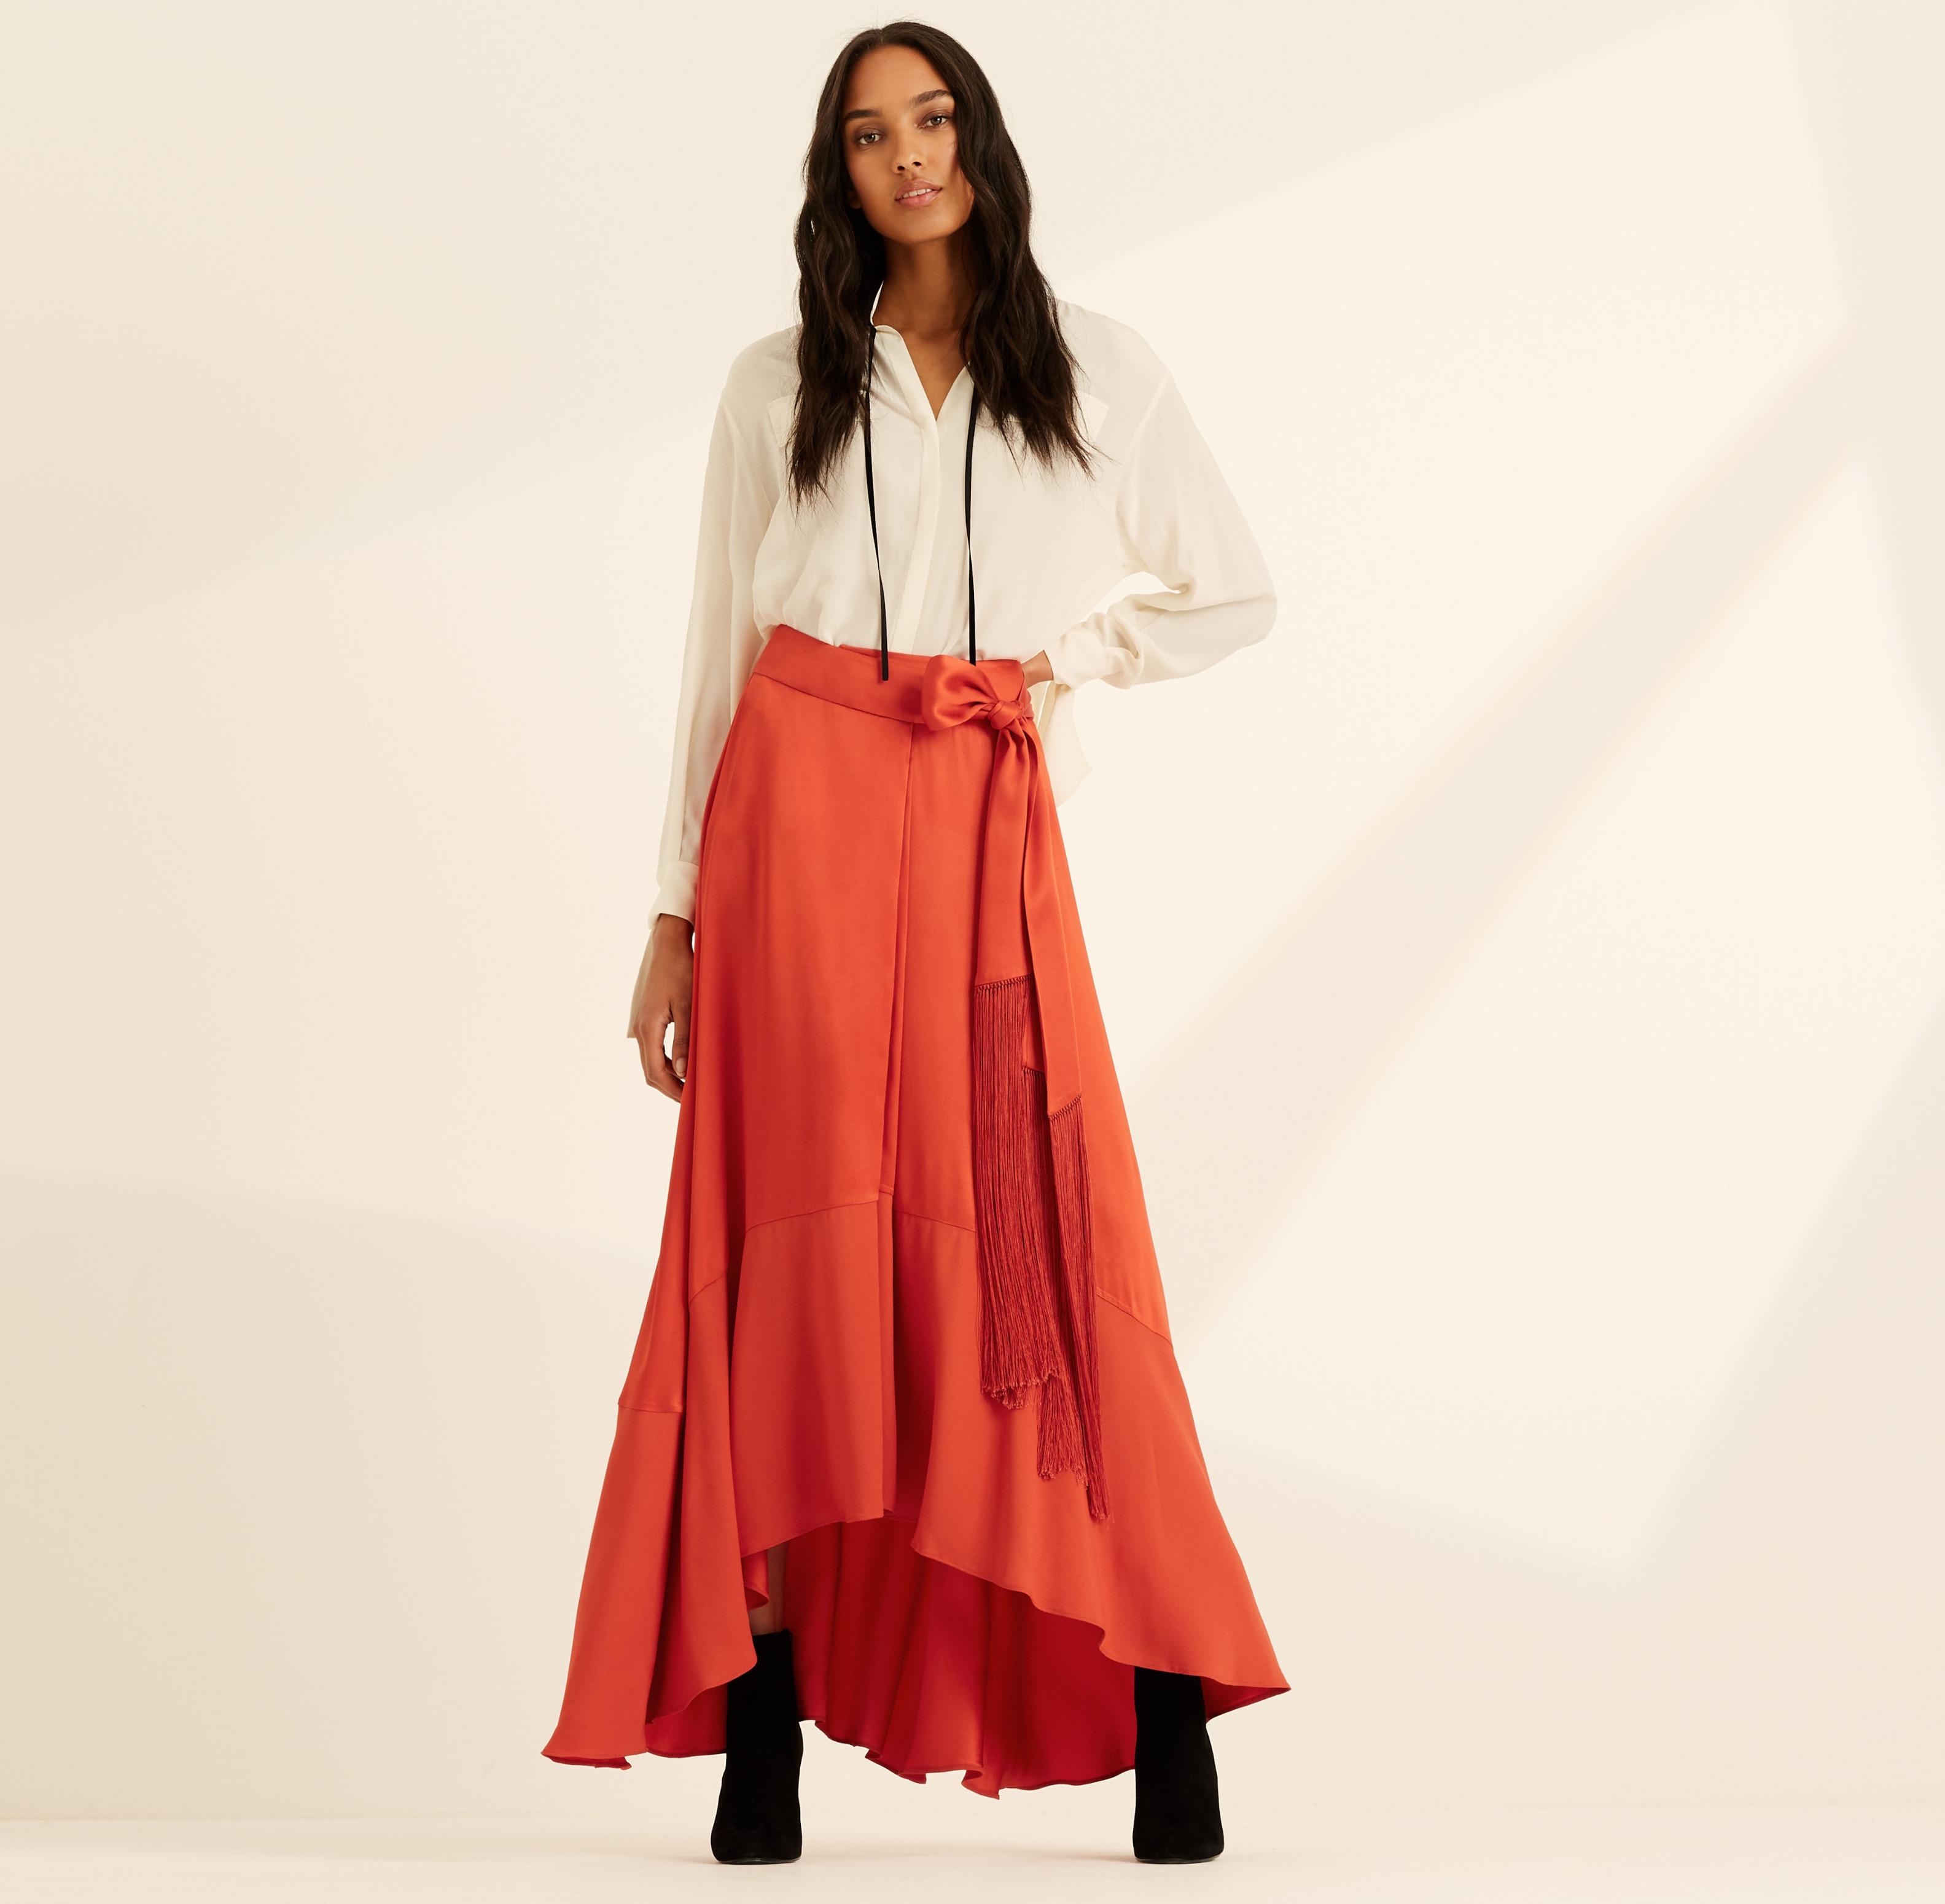 Amanda Wakeley Spice Tie Satin Skirt